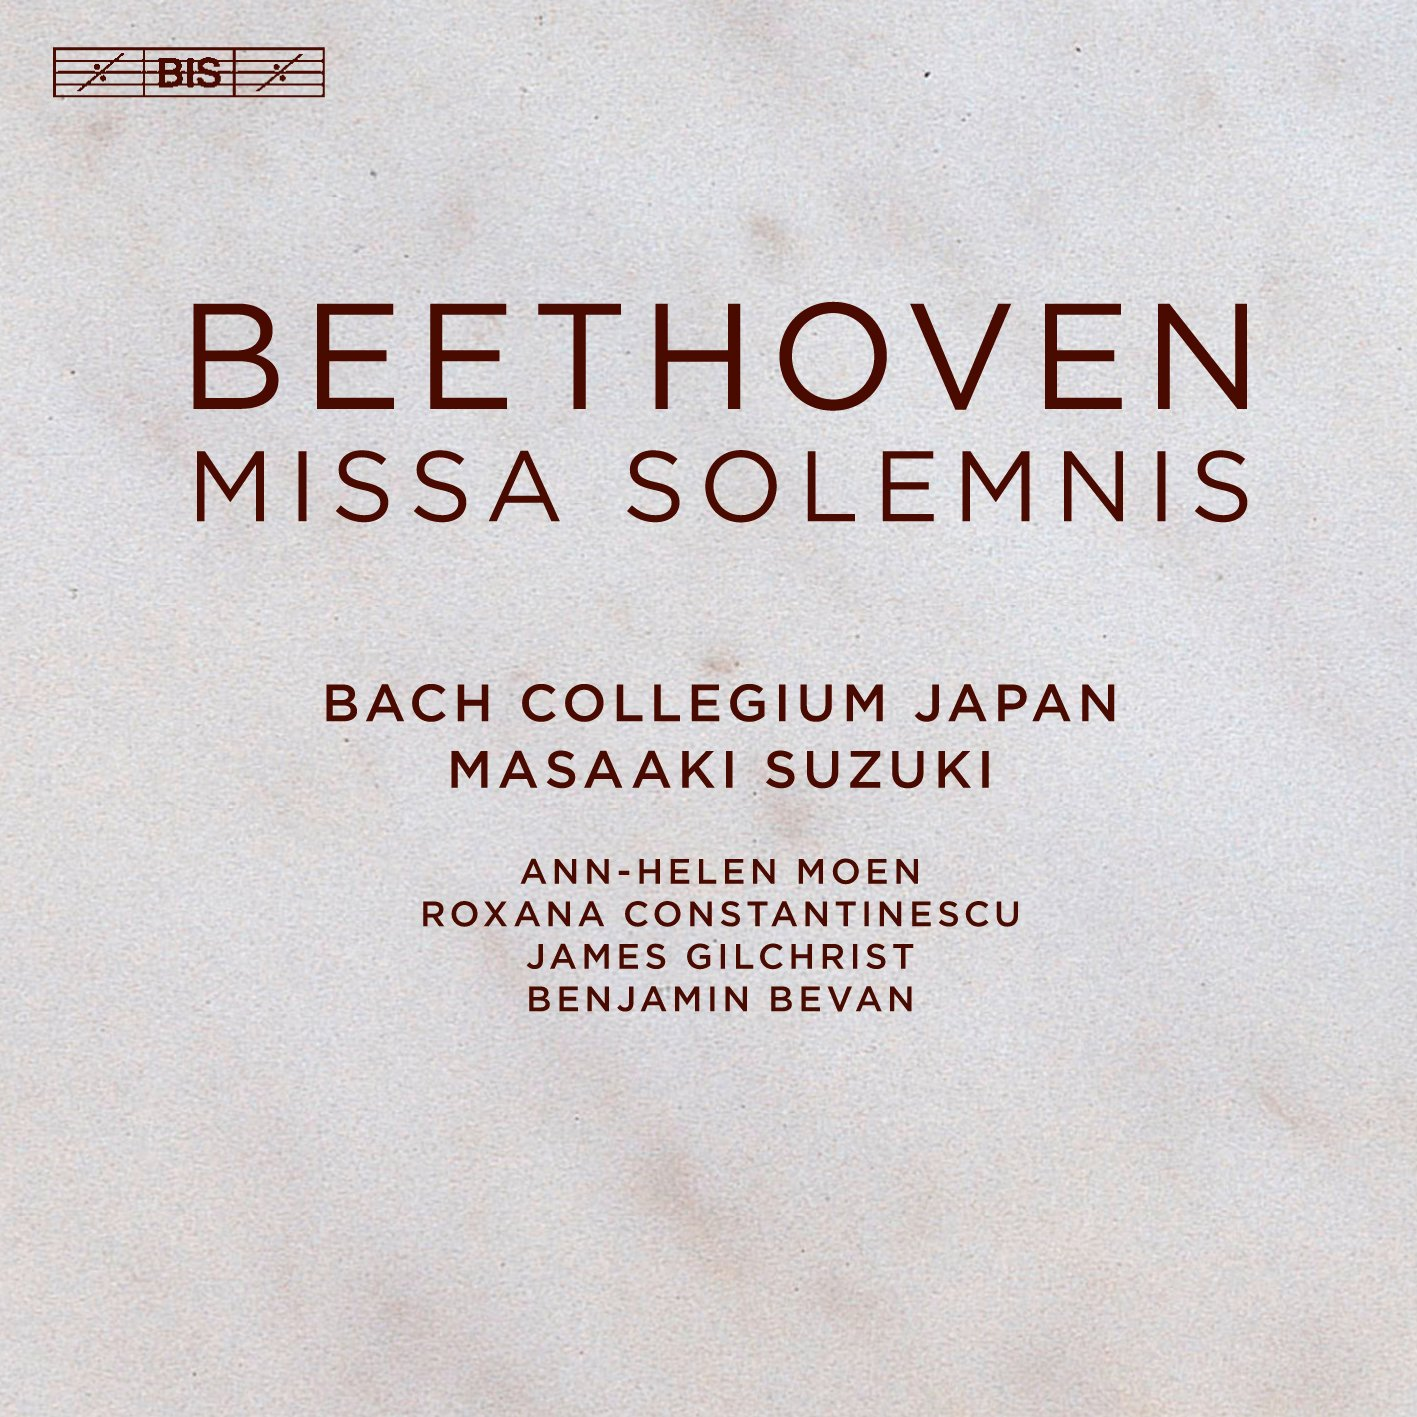 SACD : James Gilchrist - Bach Collegium Japan - Benjamin Bevan - Roxana Constantinescu - Ann-Helen Moen - Missa Solemnis (Hybrid SACD)